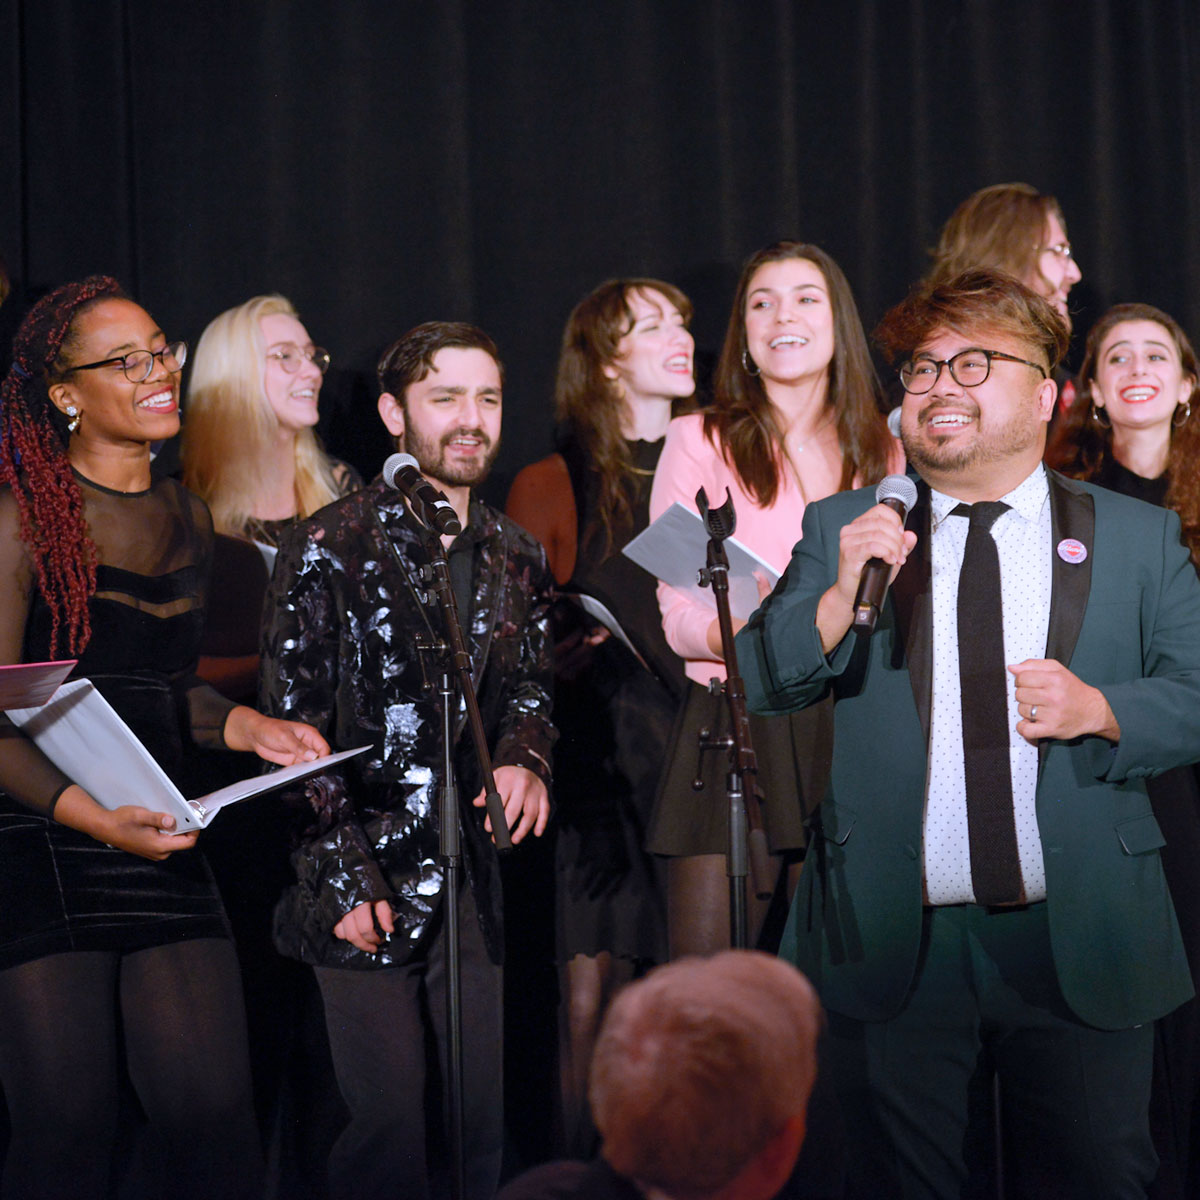 group singing performance